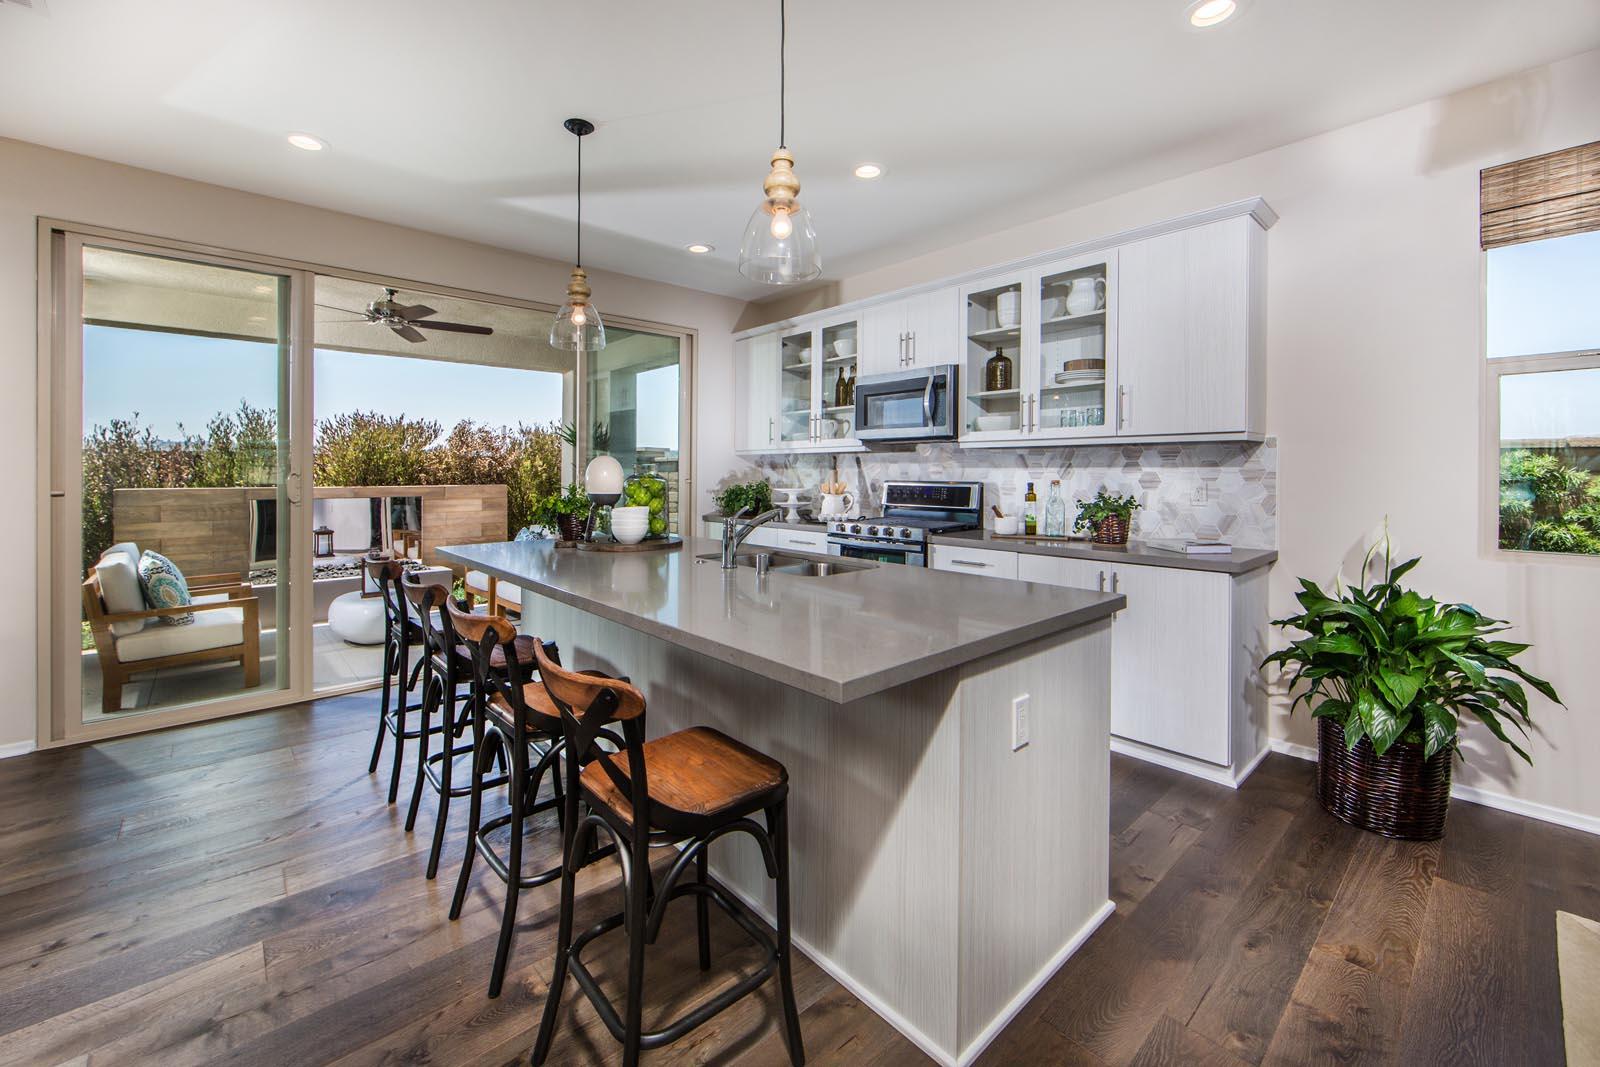 New Homes In Chula Vista Ca Prado At Escaya Aluminum Wiring California Residence 1 Kitchen The Village Of